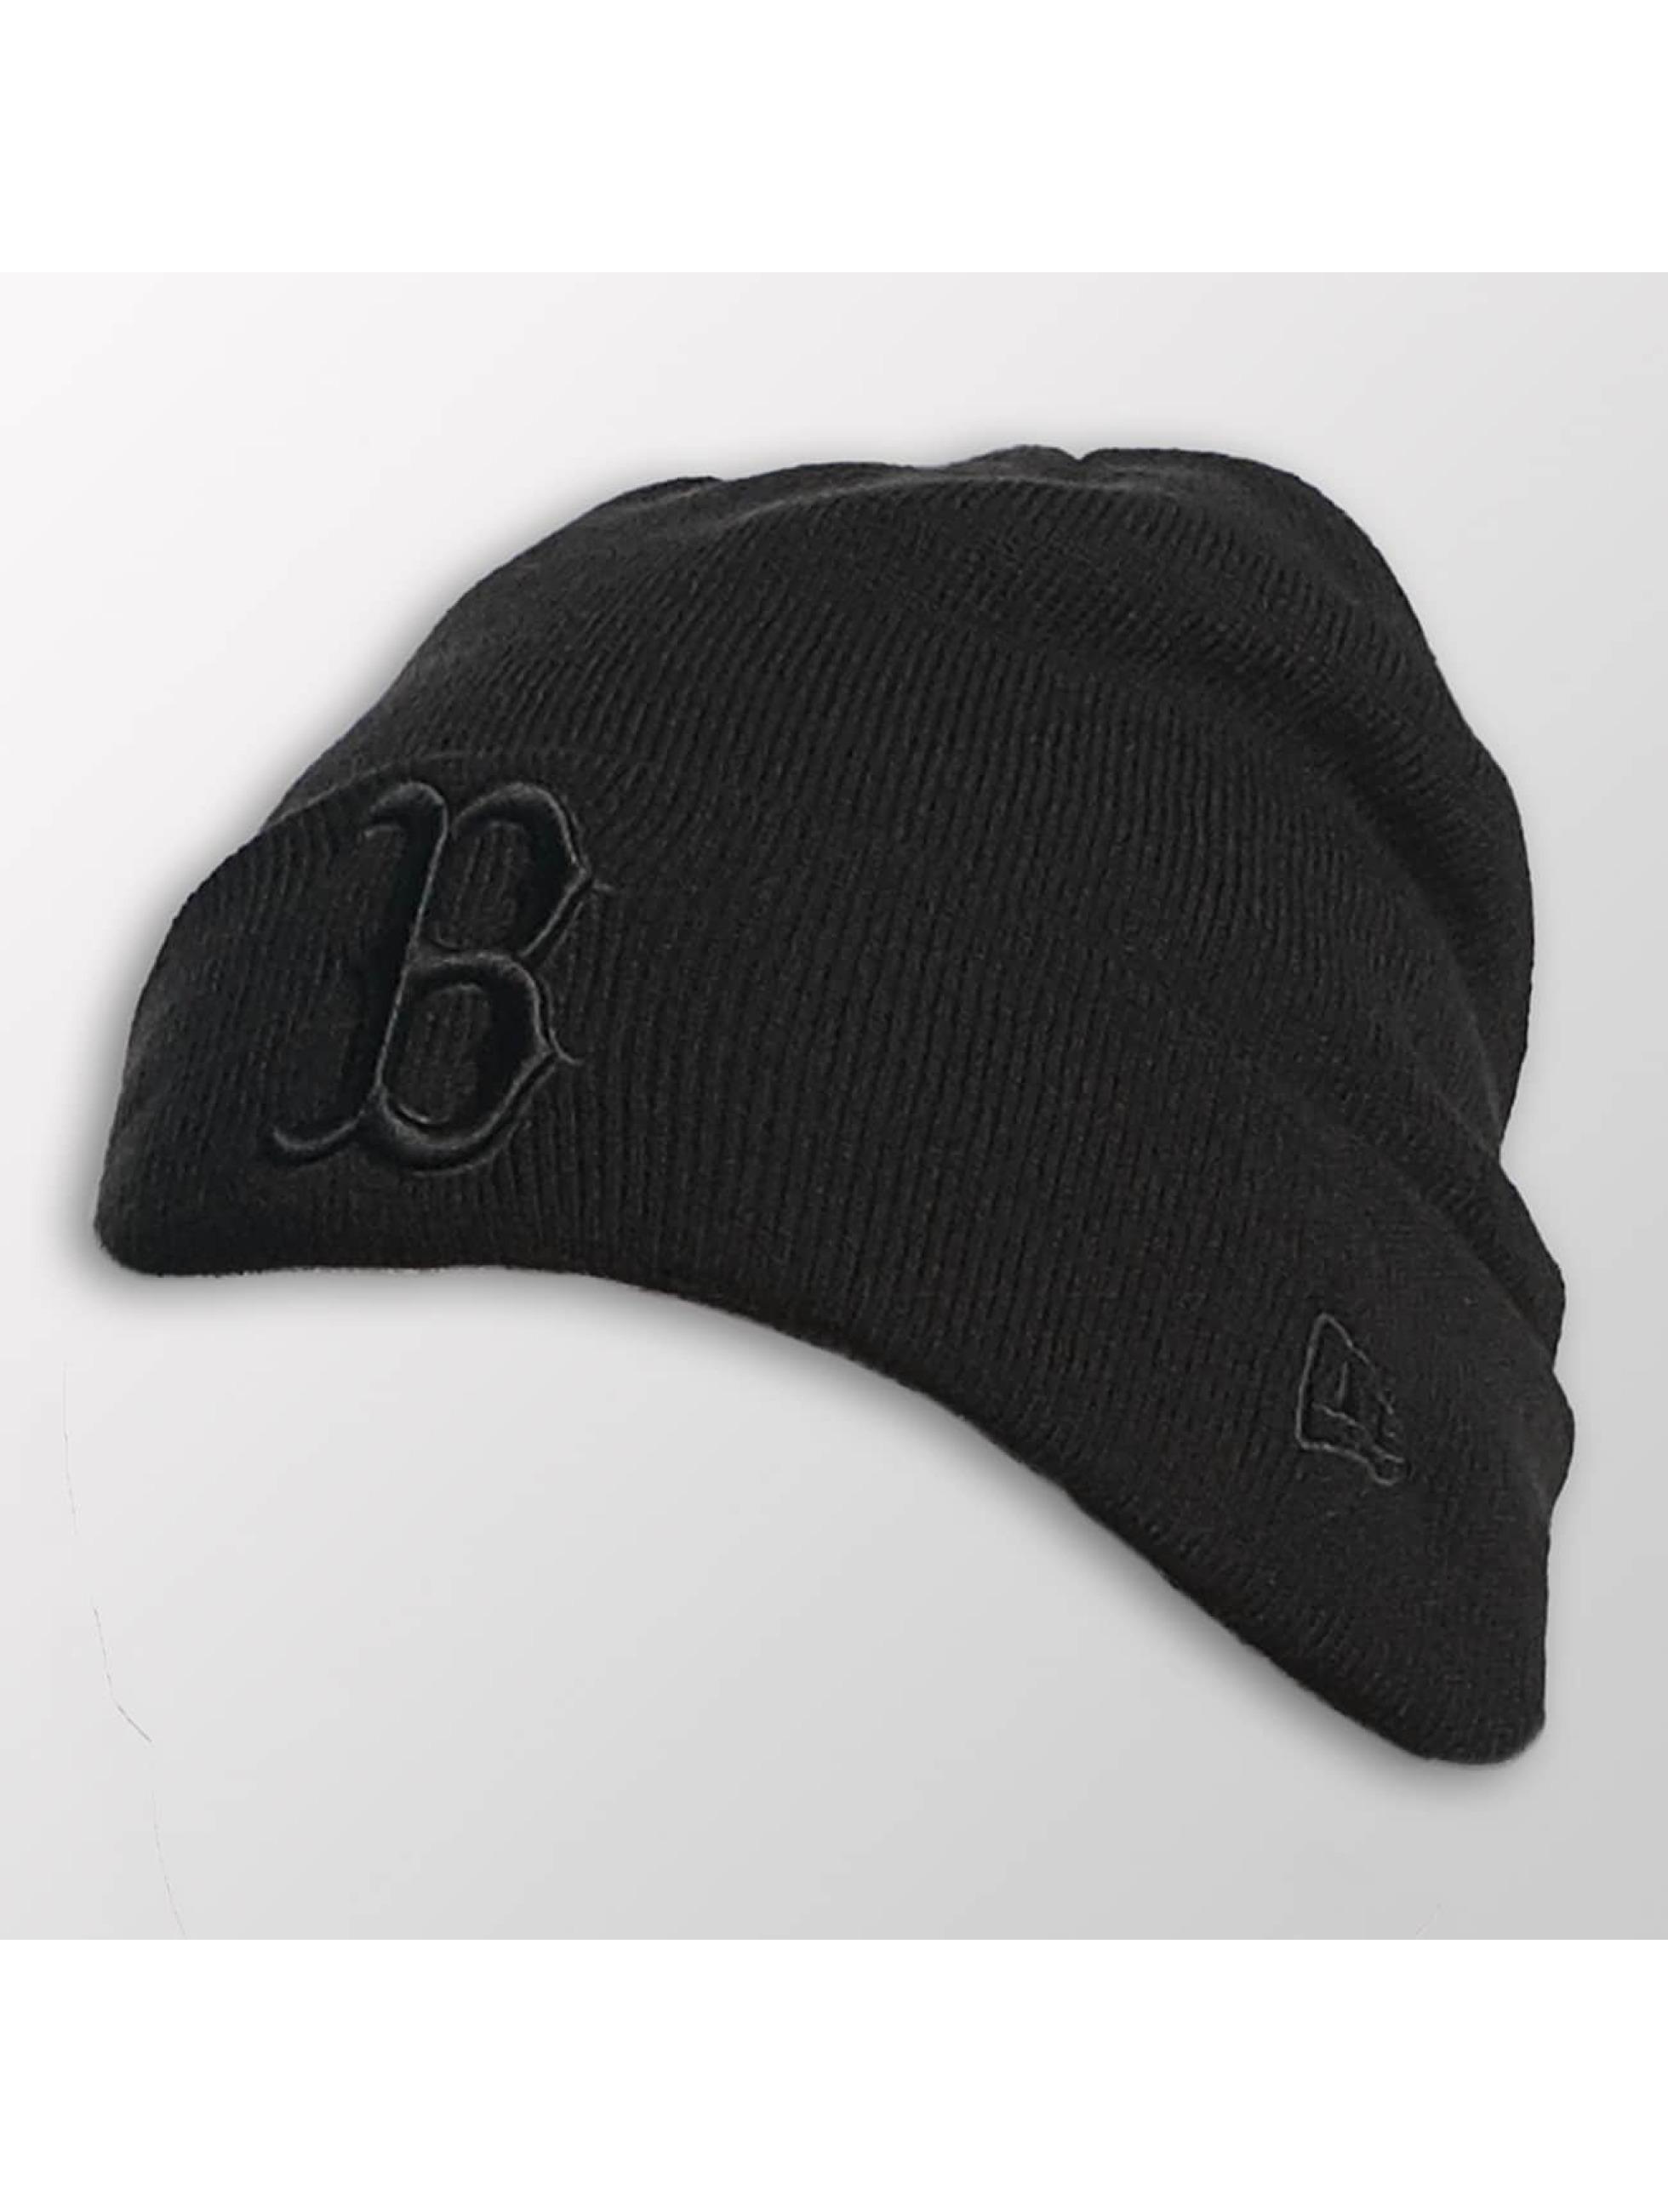 New Era Männer,Frauen Beanie Seasonal Cuff Boston Red Sox in schwarz